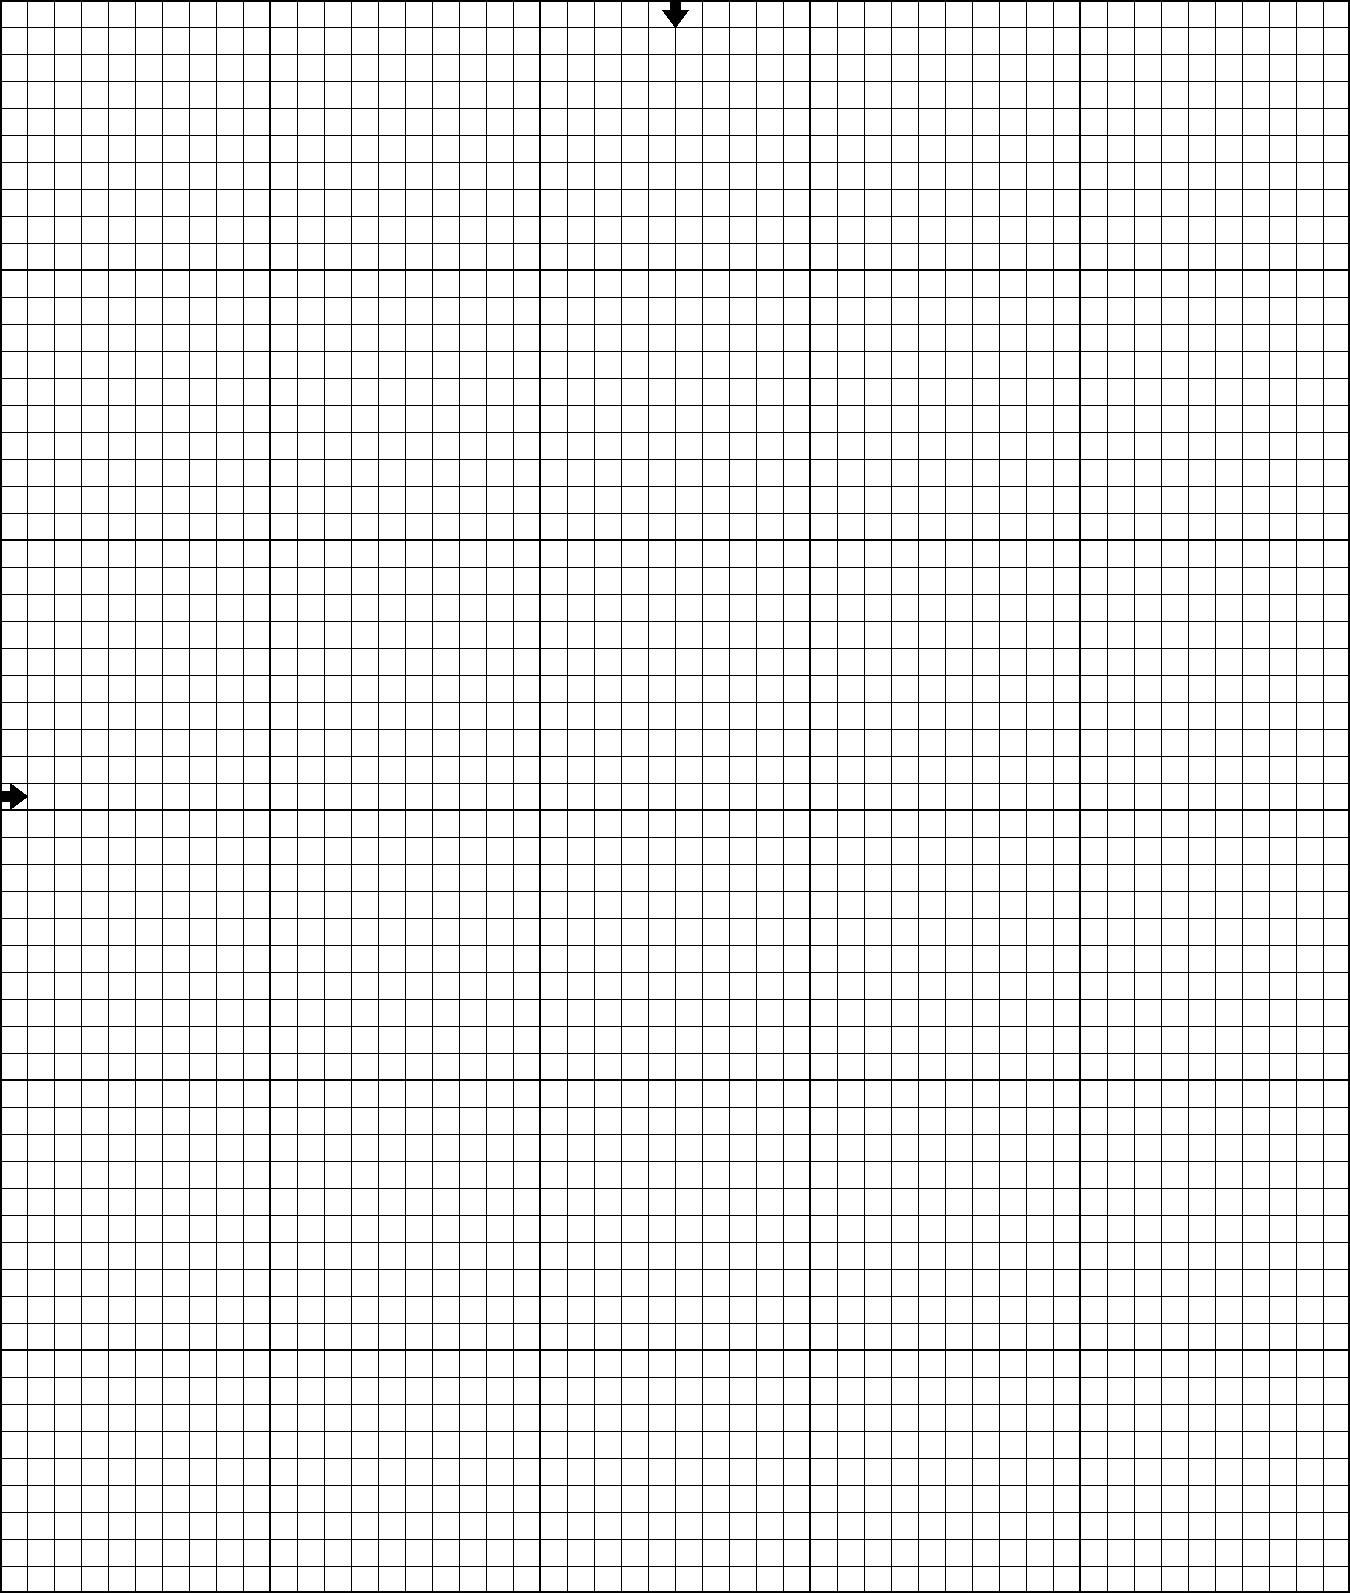 Blank Cross Stitch Graph Needles Cross Stitch Cross